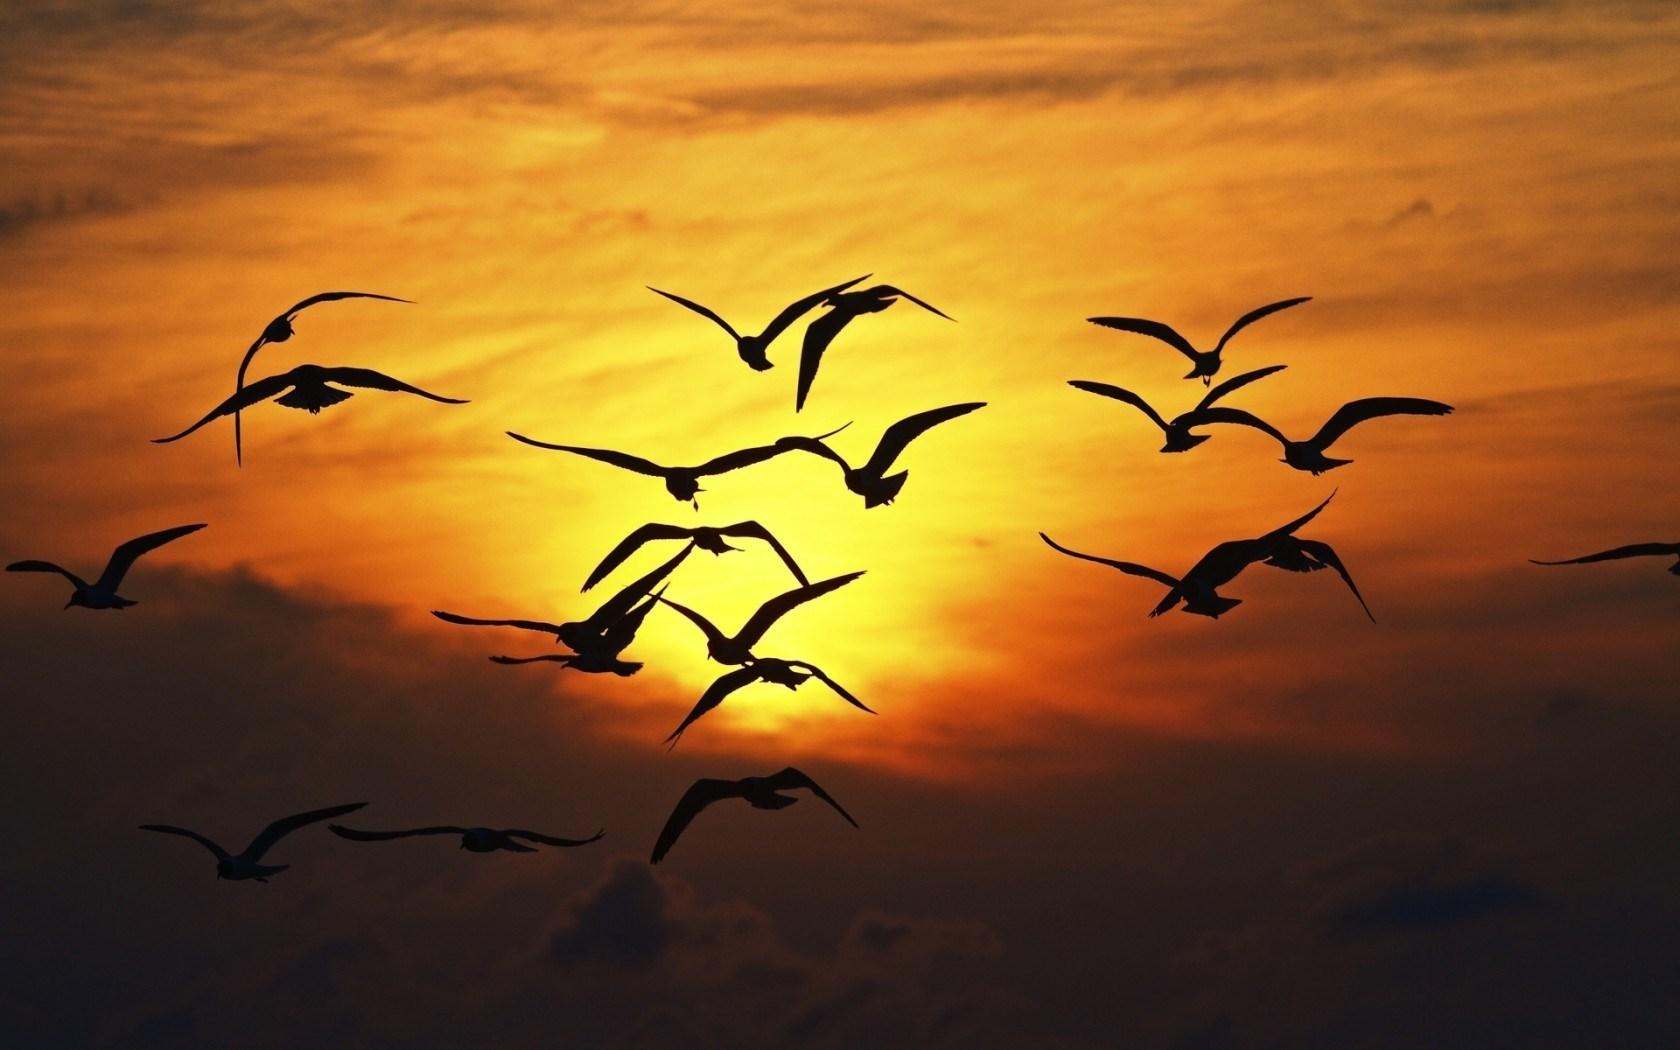 birds silhouette sunset wallpaper 49053